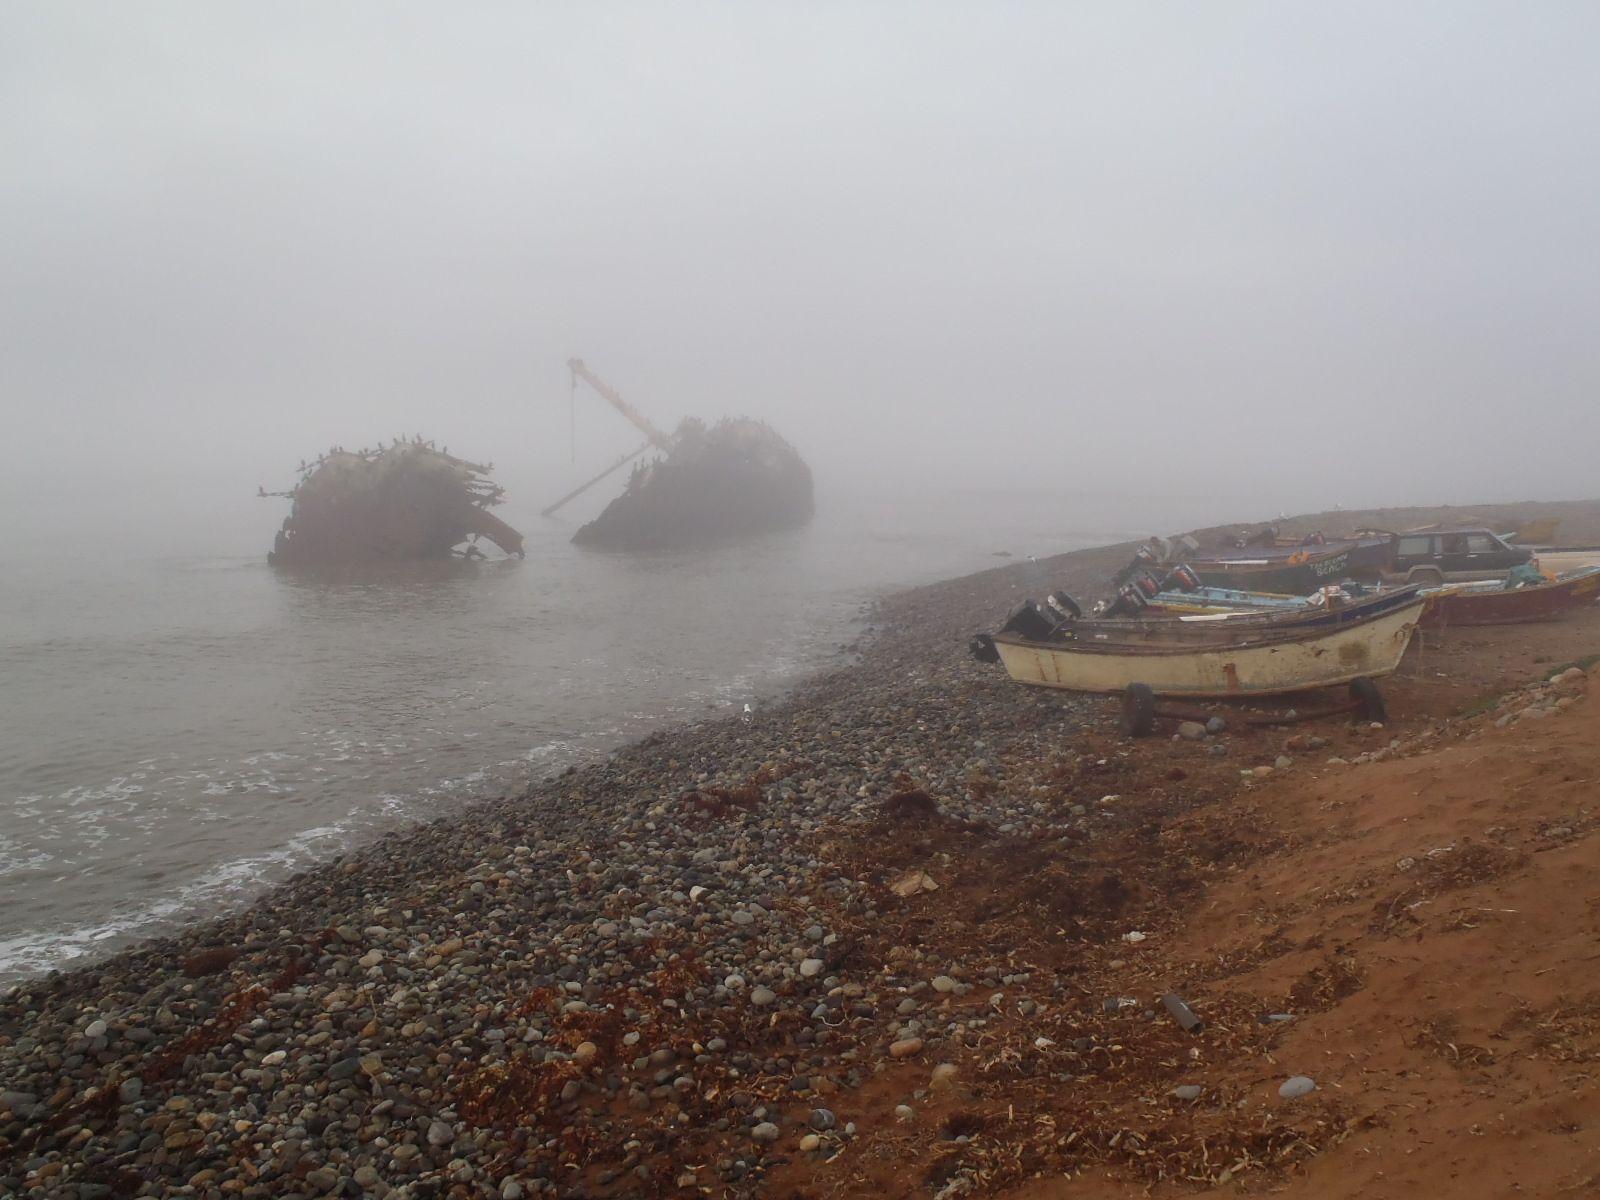 Shipwreck in the fog.